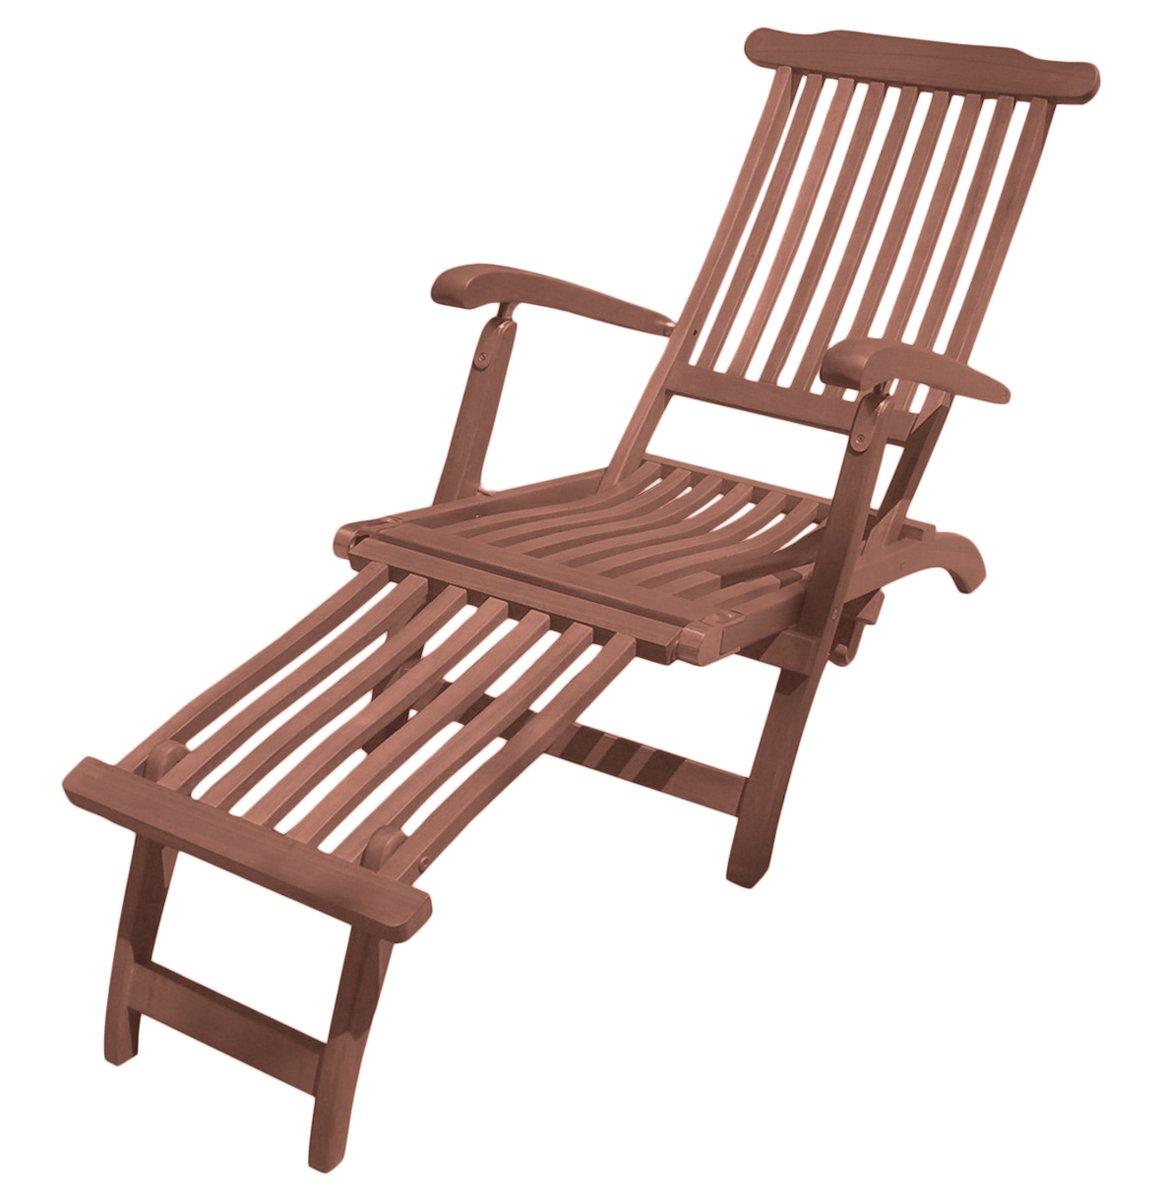 Deckchair Phoenix aus geöltem Eukalyptus Gartenliege Holzliege Sonnenliege Liege